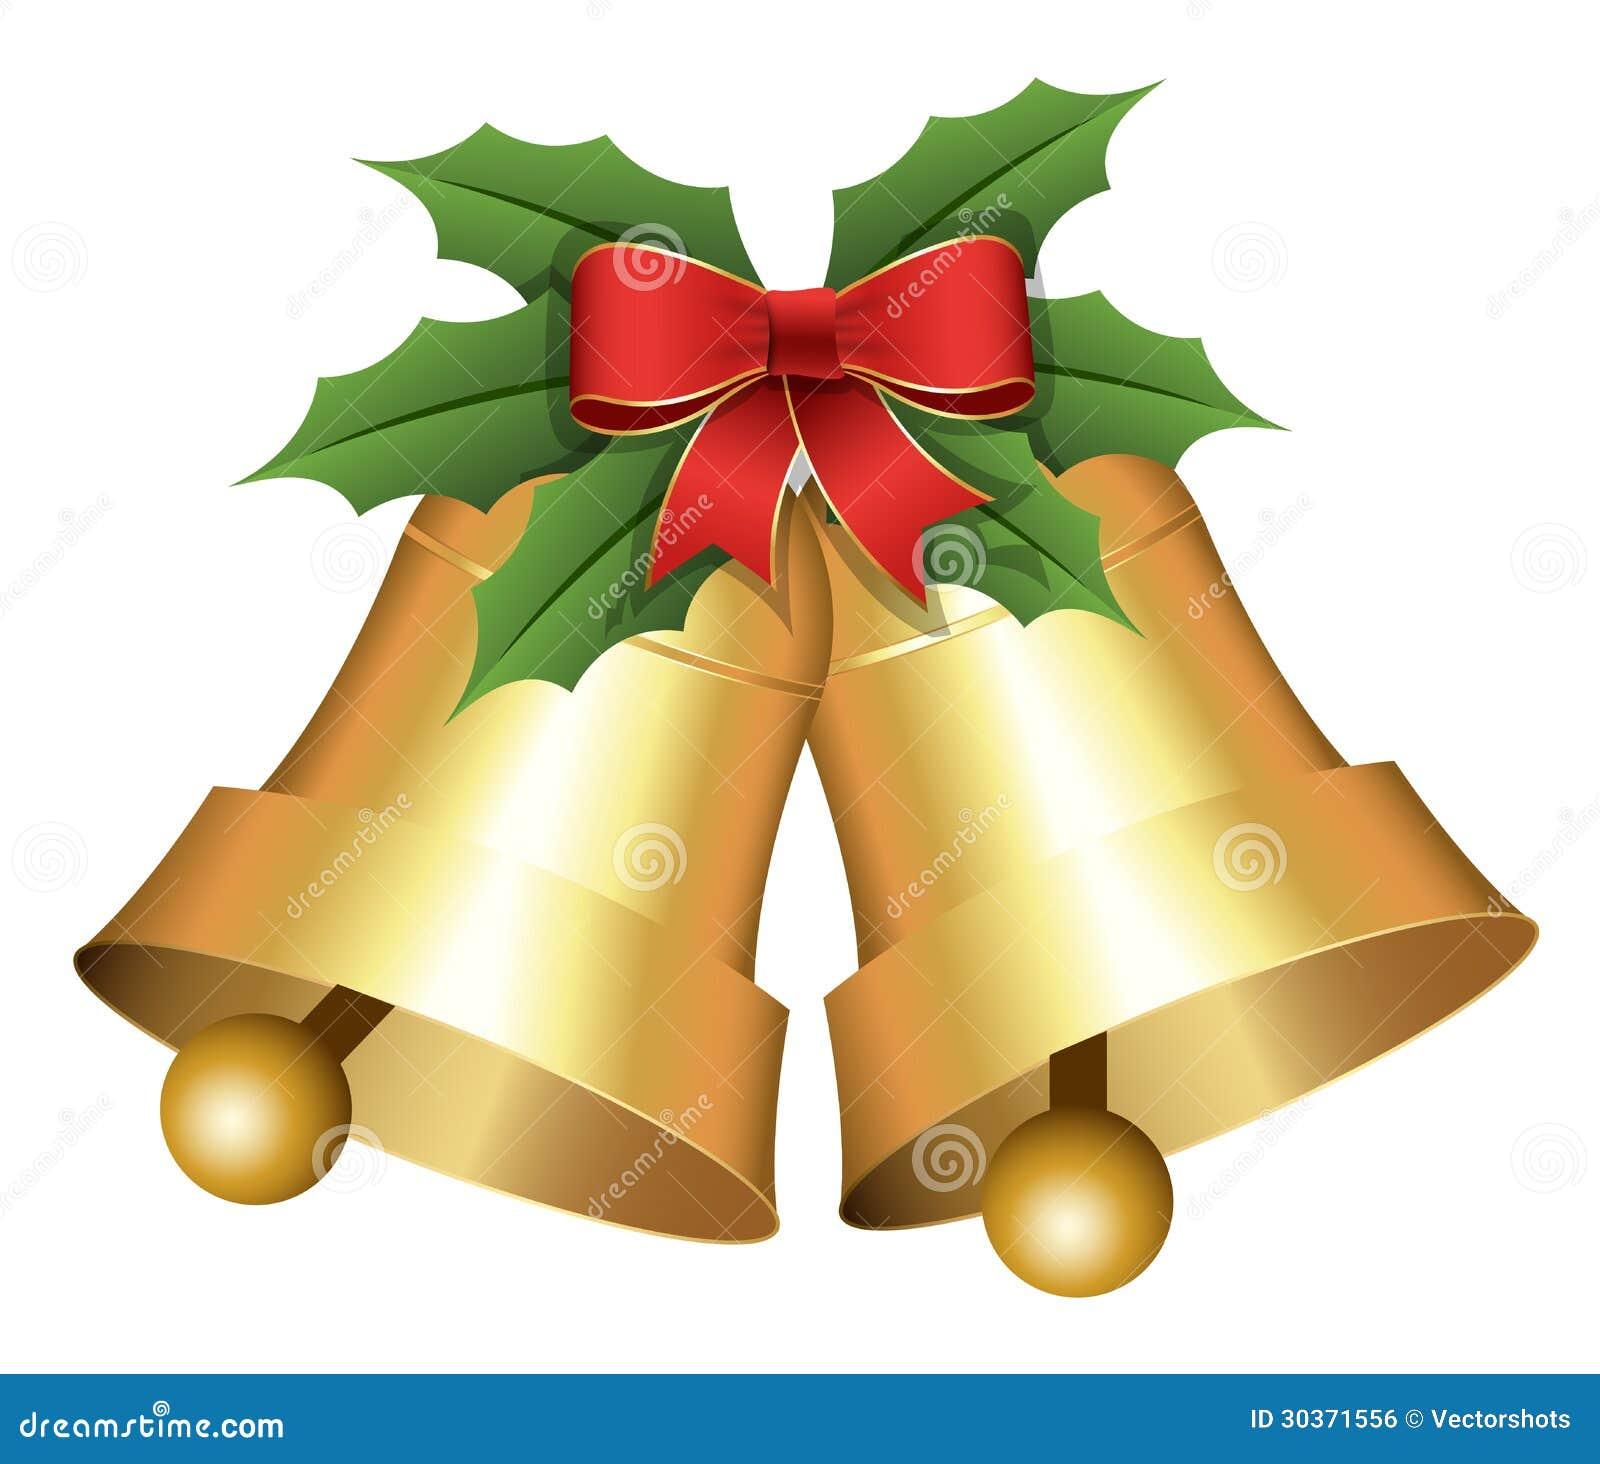 Beautiful Christmas Bells Royalty Free Stock